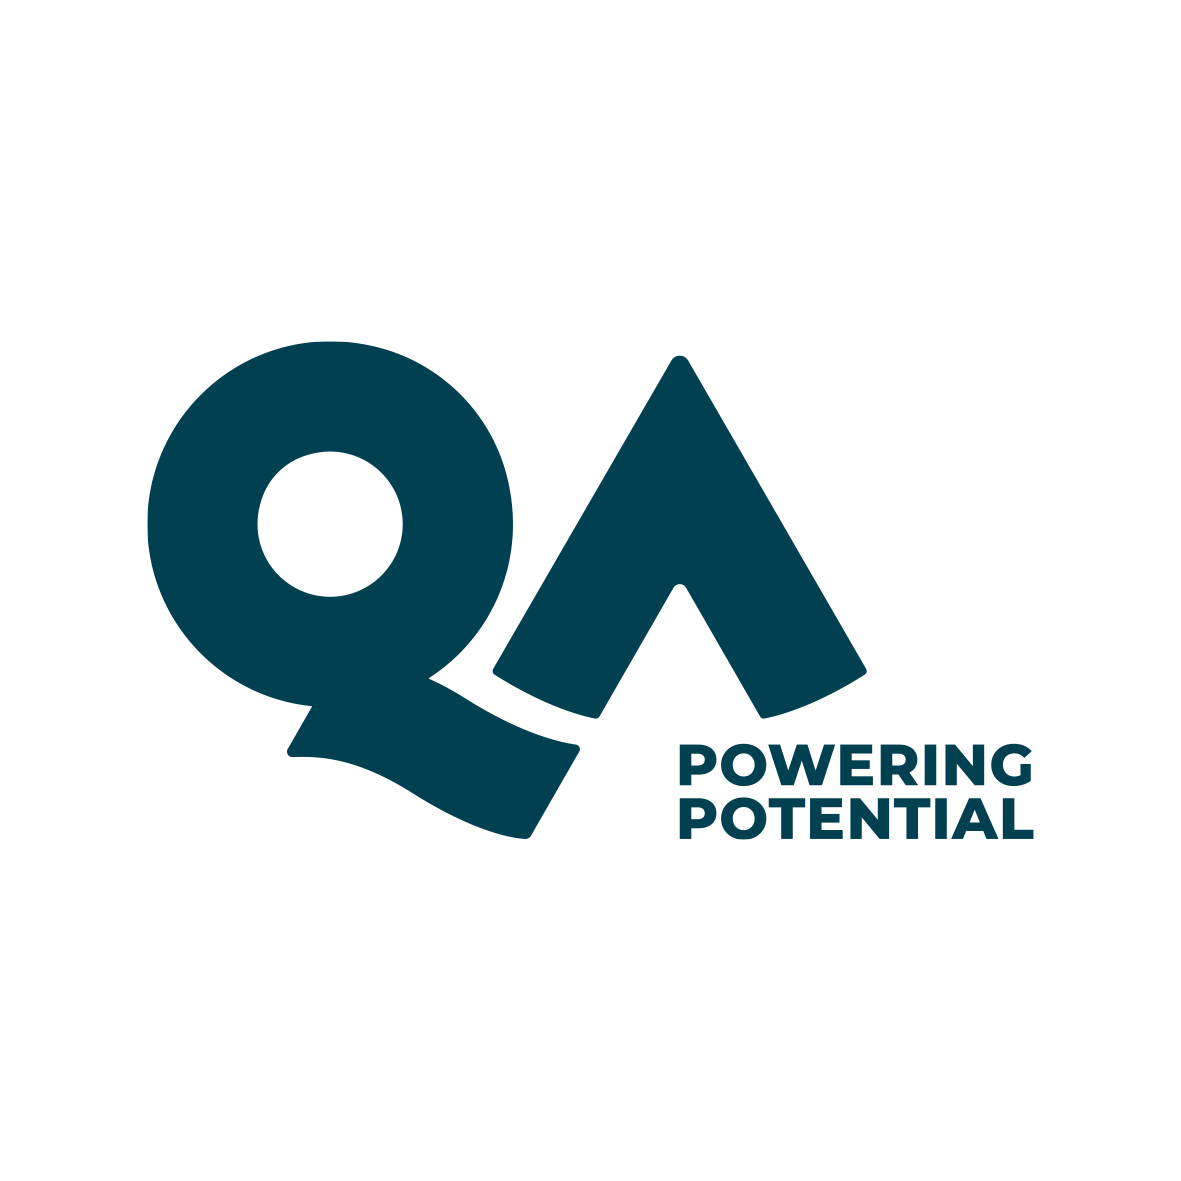 Colleges & Training Providers: QA